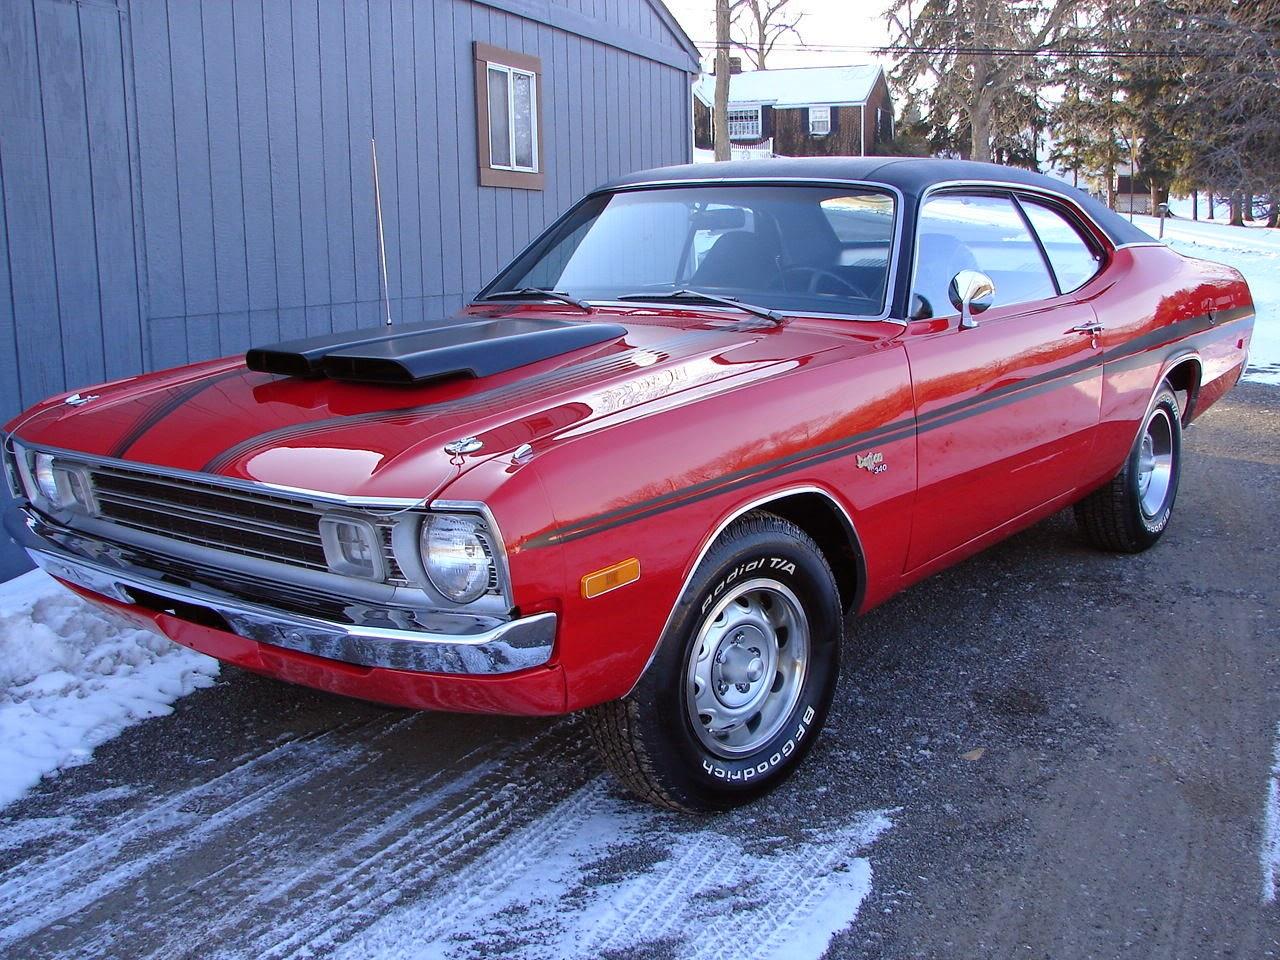 All American Classic Cars: 1972 Dodge Dart Demon 340 2 ...